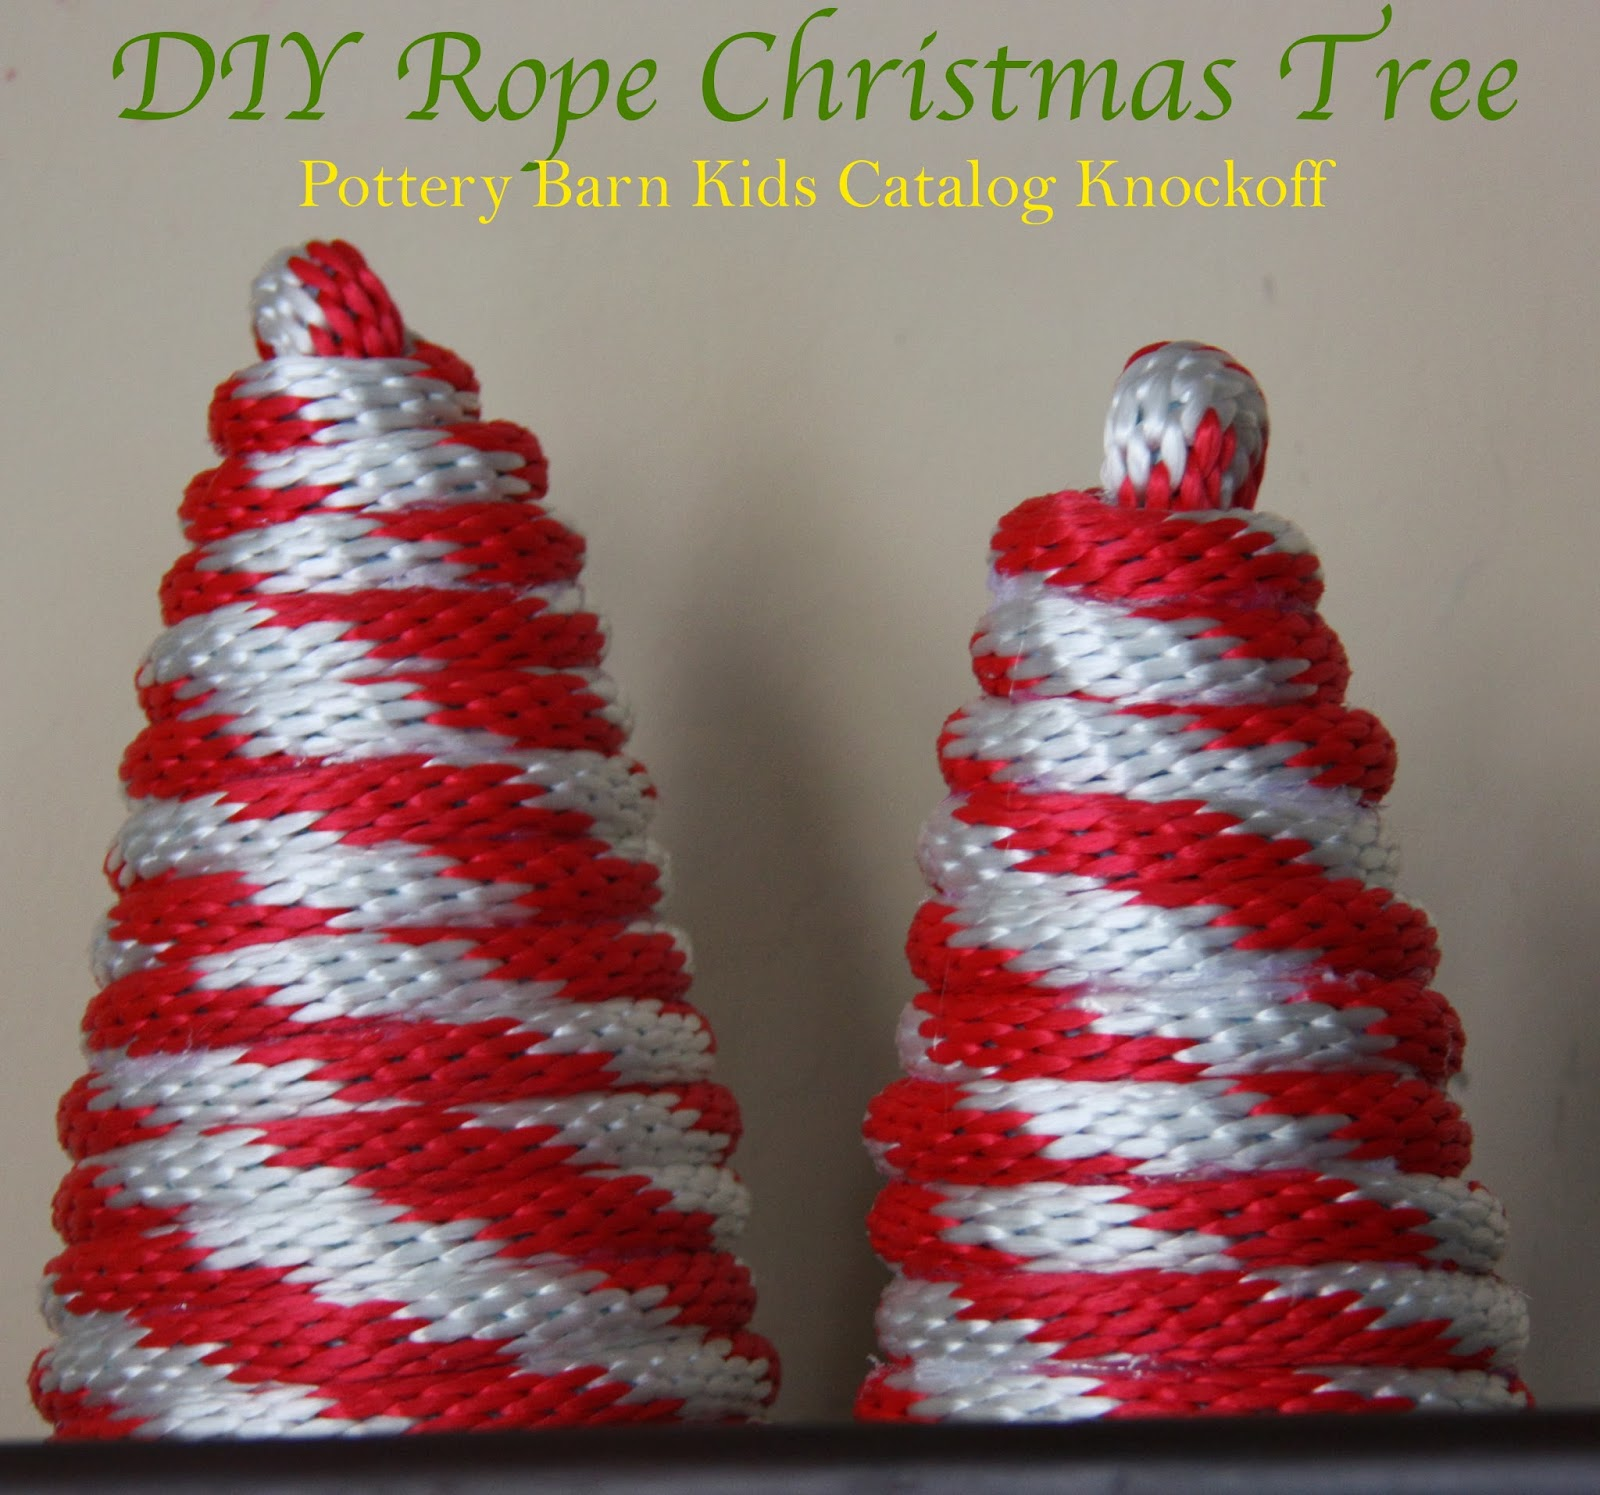 diy christmas tree decorations - Pottery Barn Christmas Trees